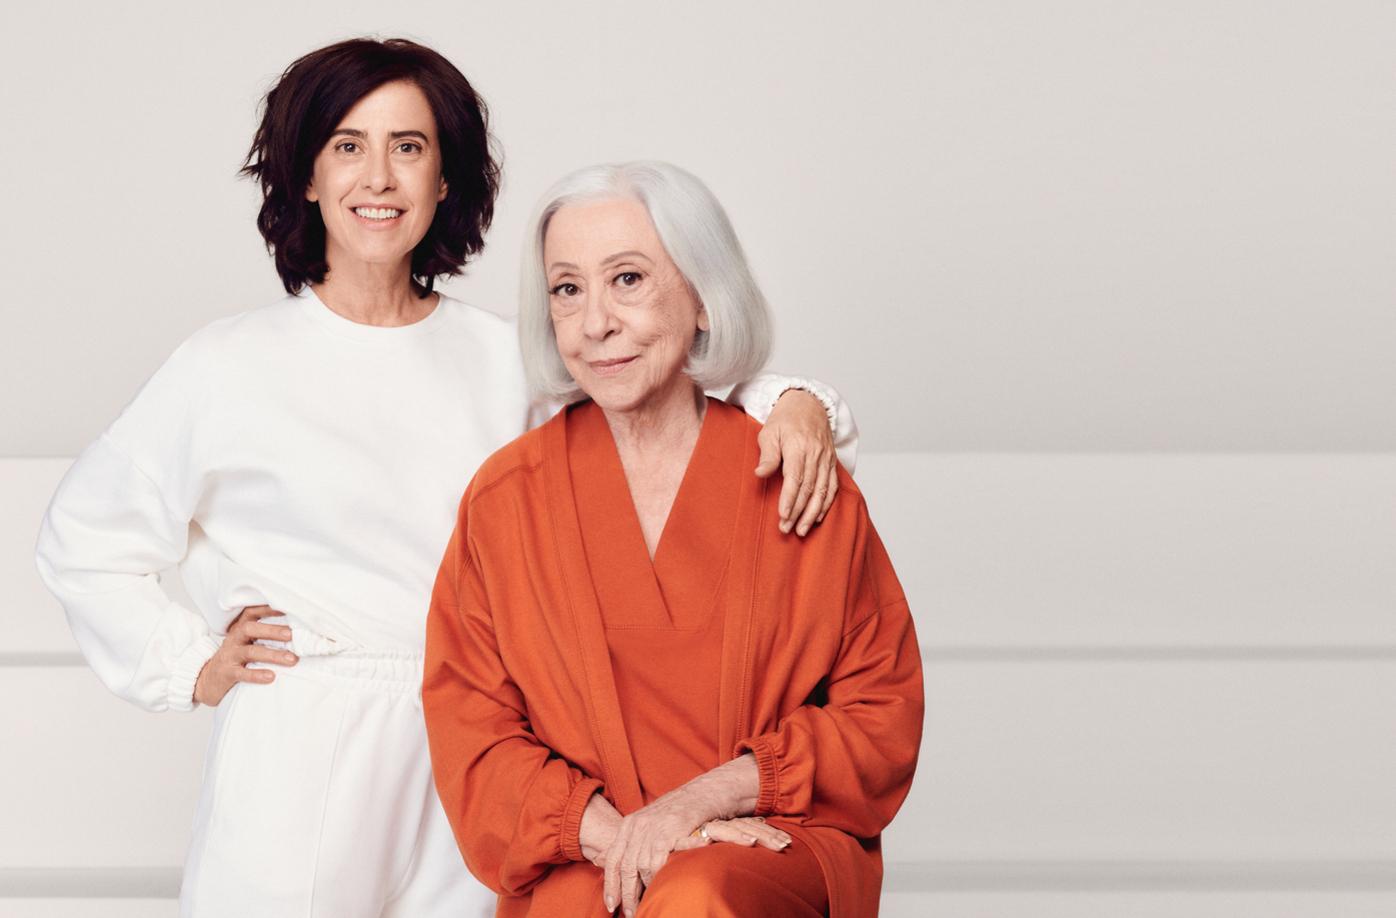 Hering une Fernanda Montenegro e Fernanda Torres para celebrar Dia das Mães